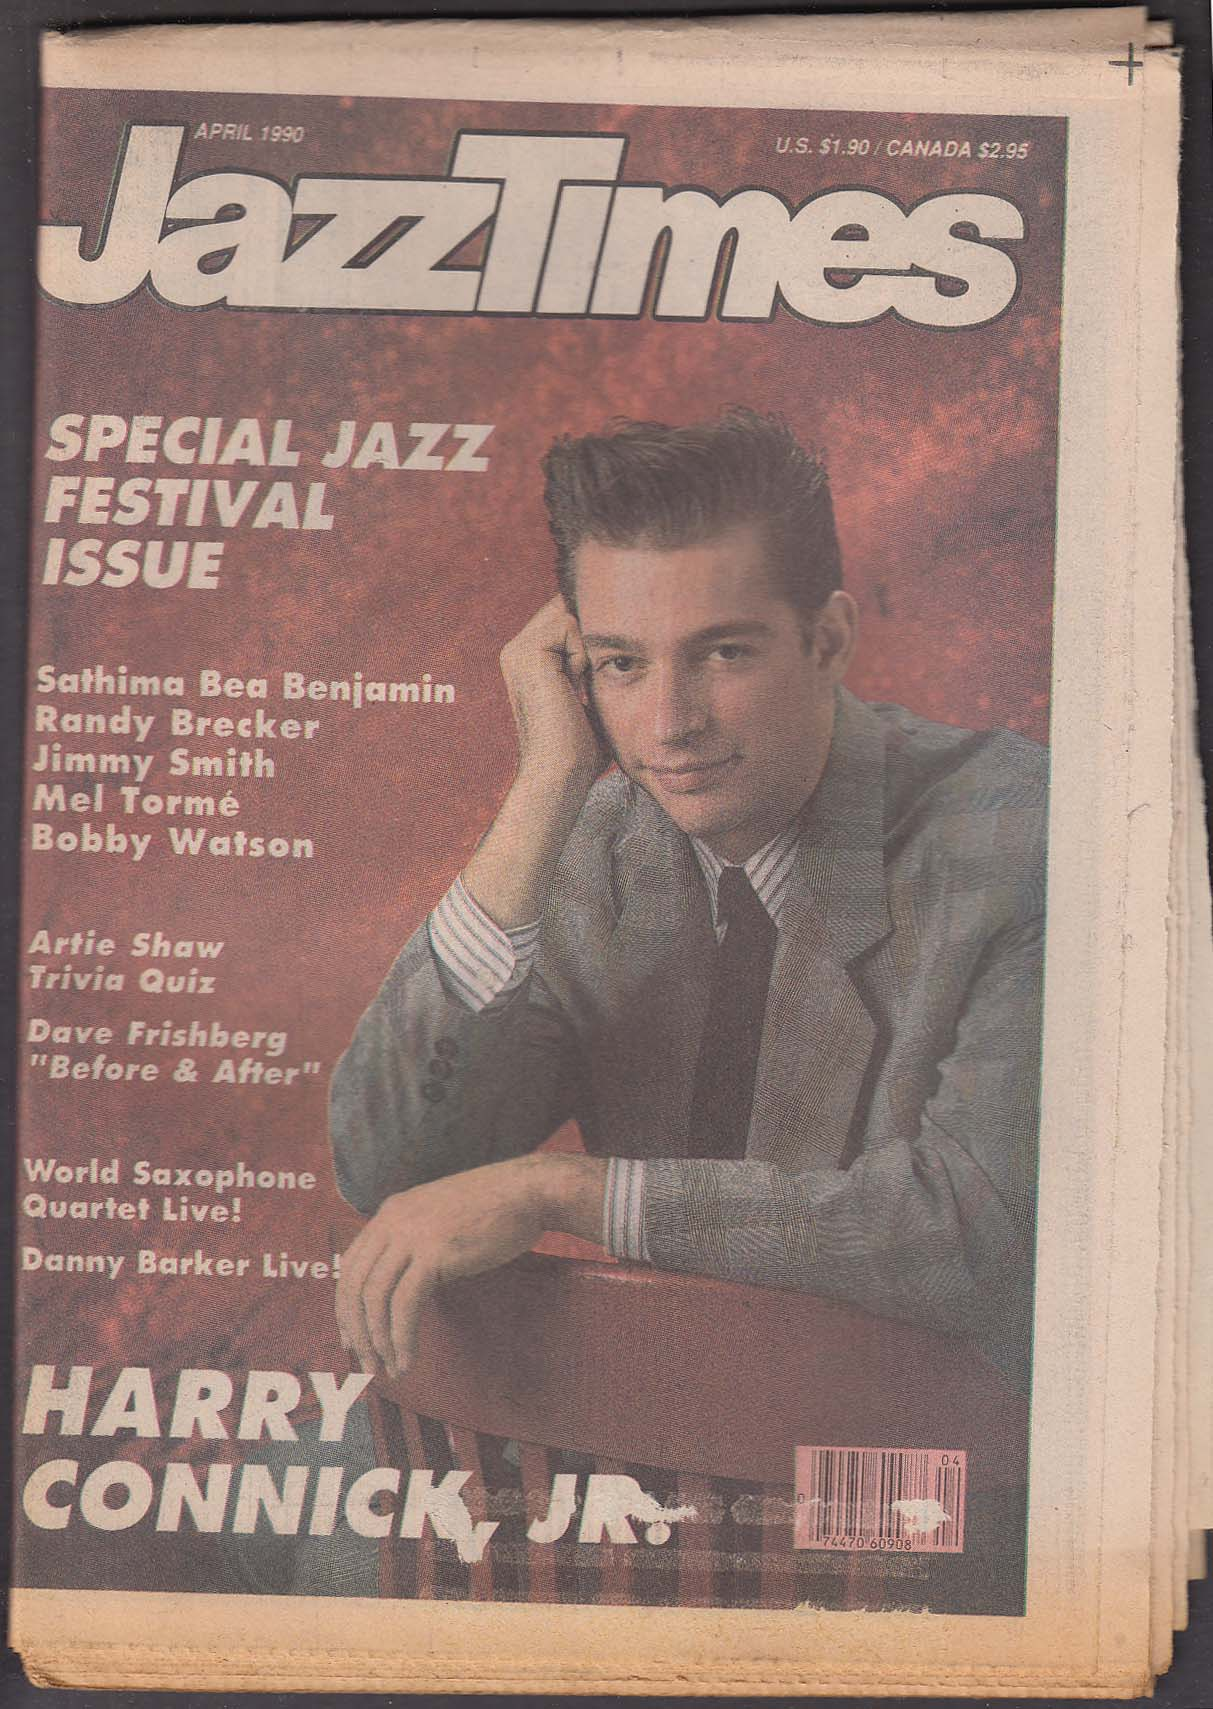 JAZZTIMES Harry Connick Jr Sathima Bea Benjamin Randy Brecker Mel Torme + 4 1990